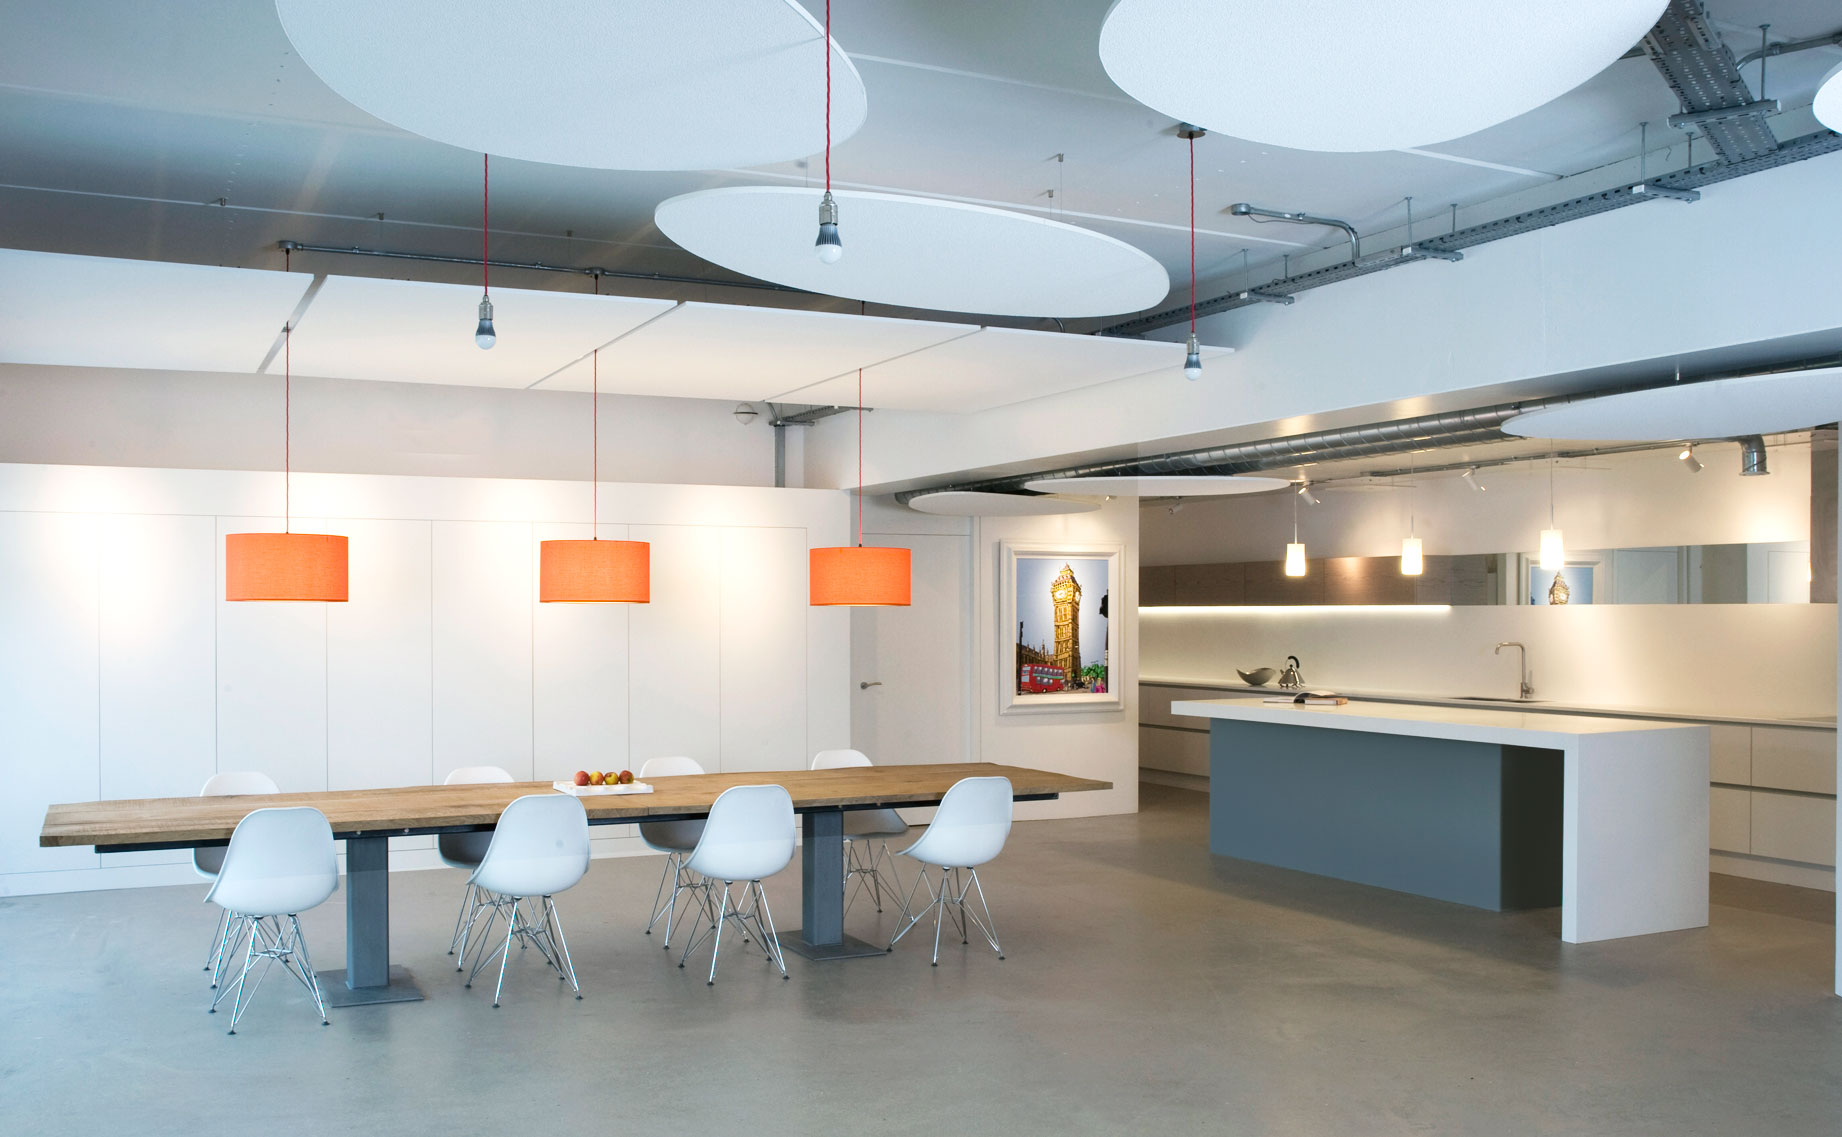 Kuche Kitchens offer superb modern style